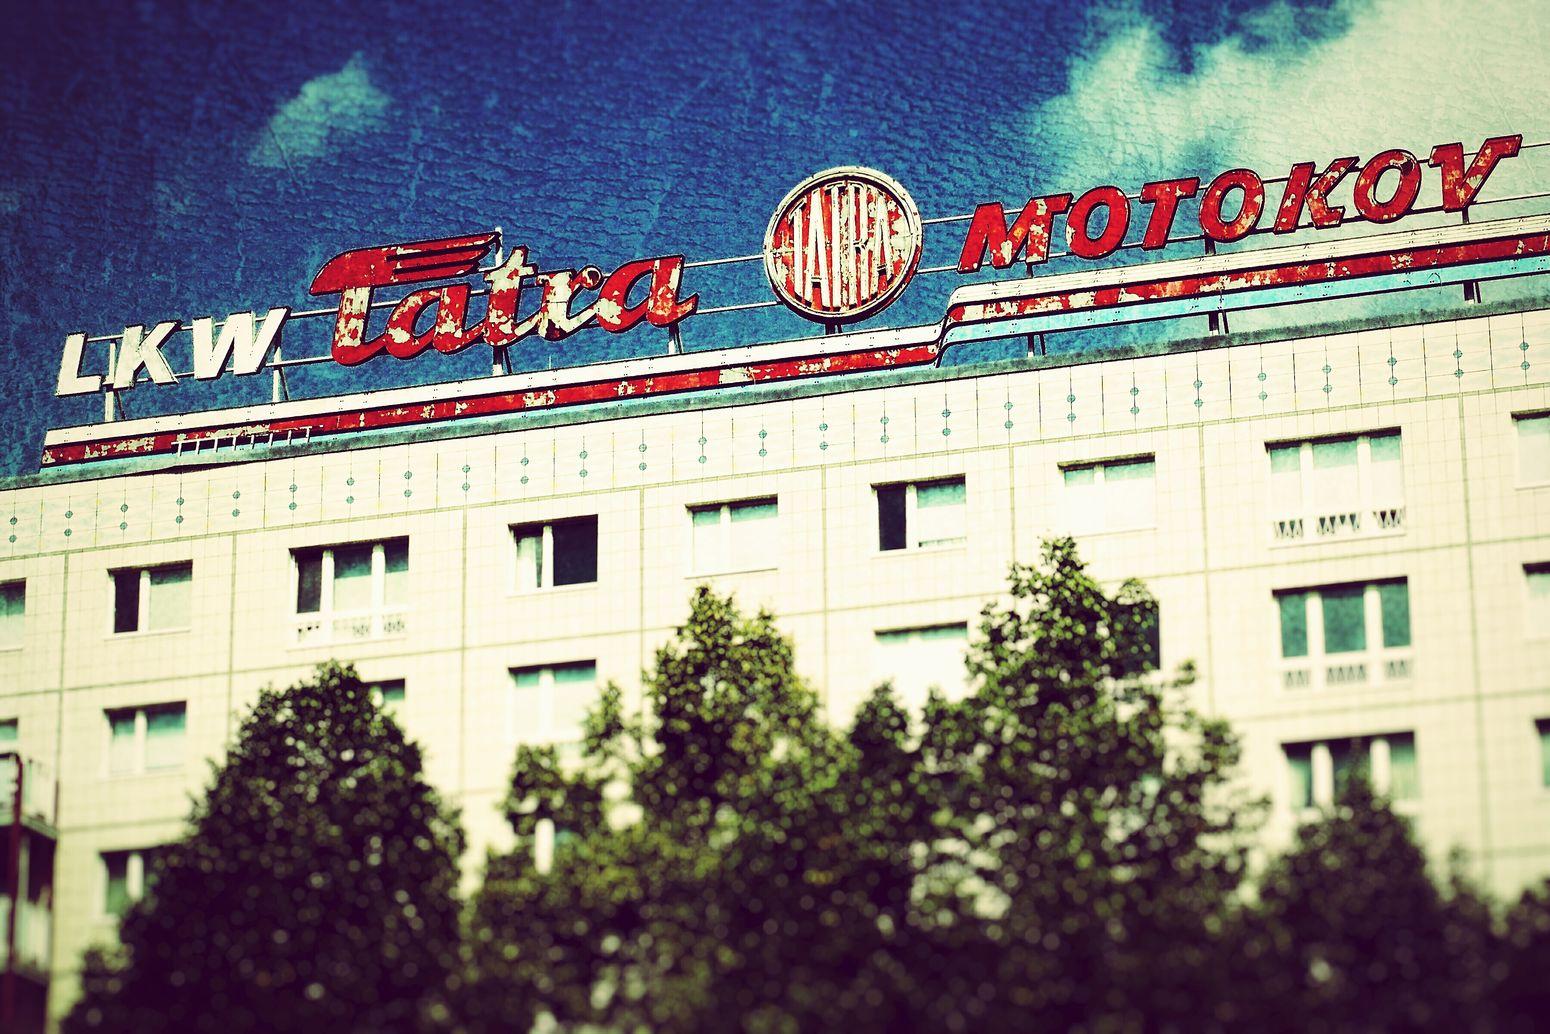 Vintage Signs Berlin Rooftop Tatra Plattenbauromantik Soviet Ghost GDR Gdrbuilding DDR Time Ghost Signs